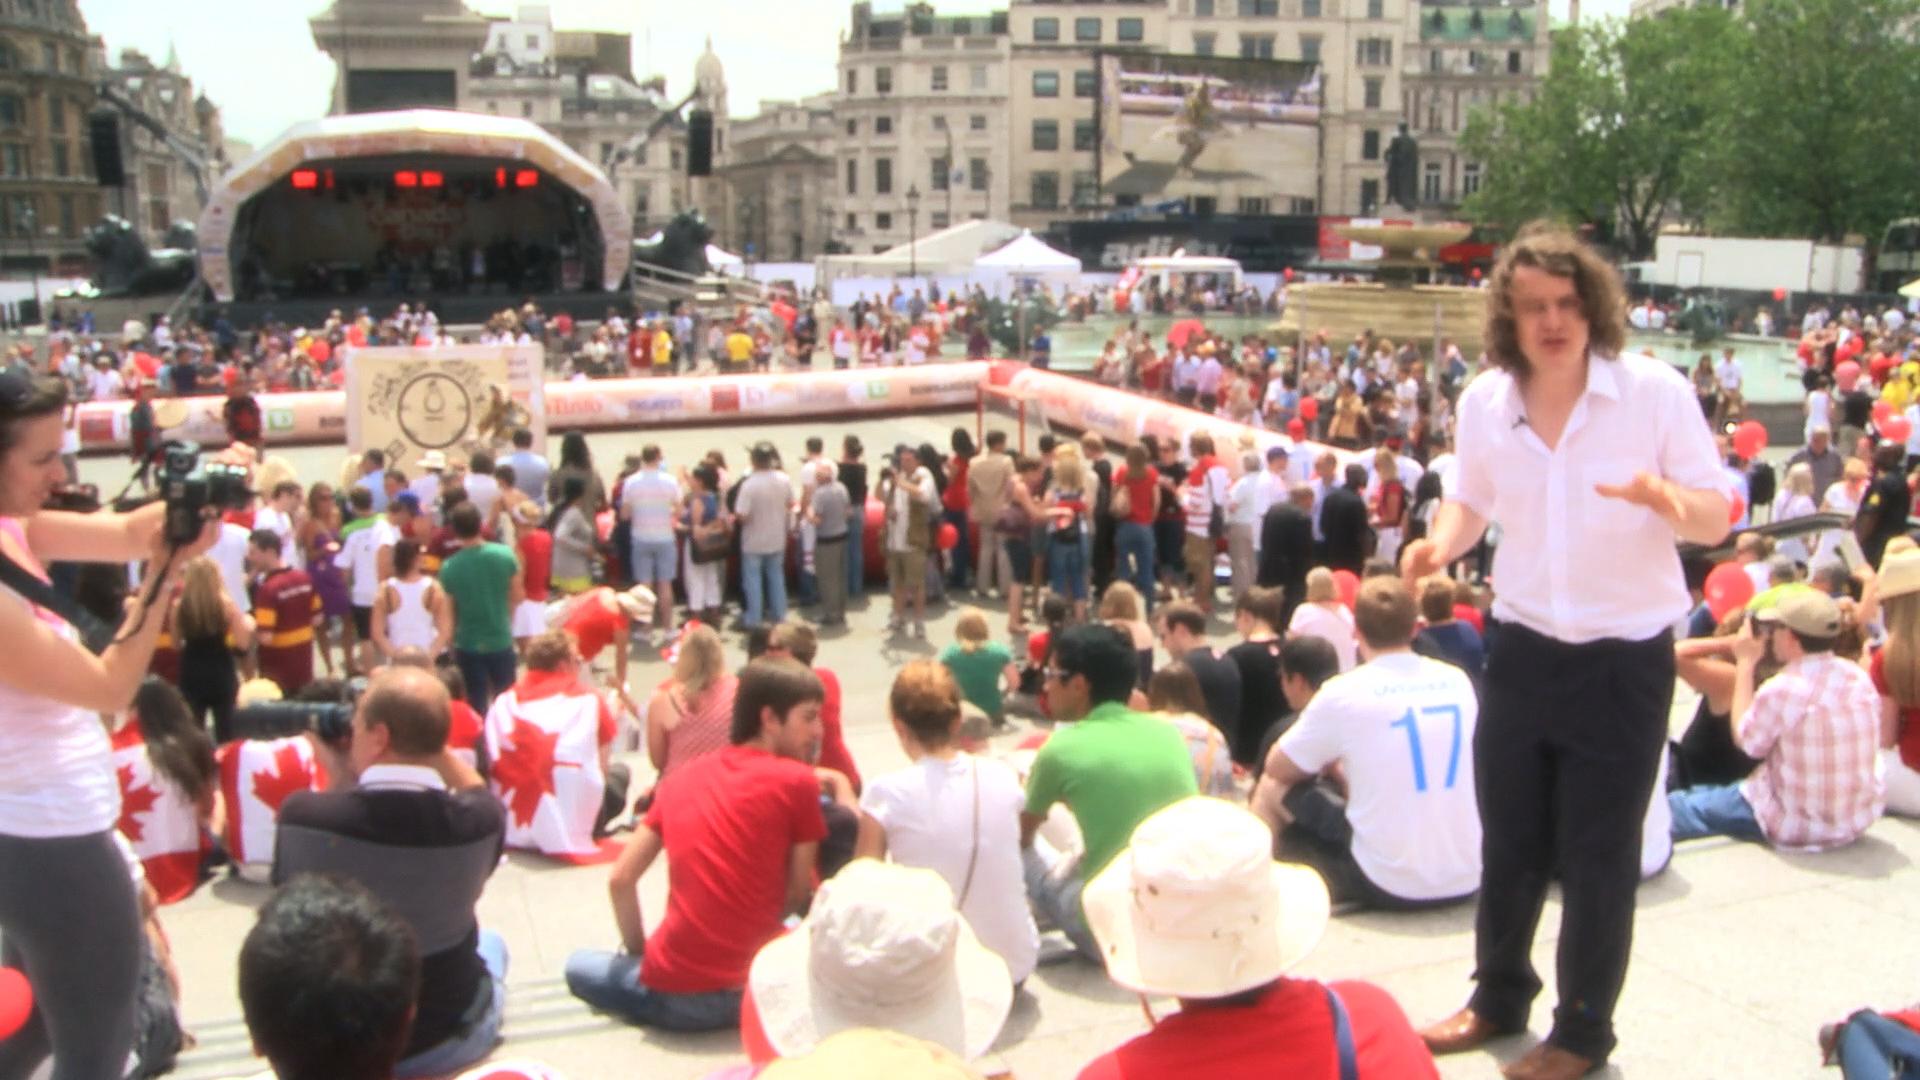 Ed amongst the Trafalgar Square Crowd